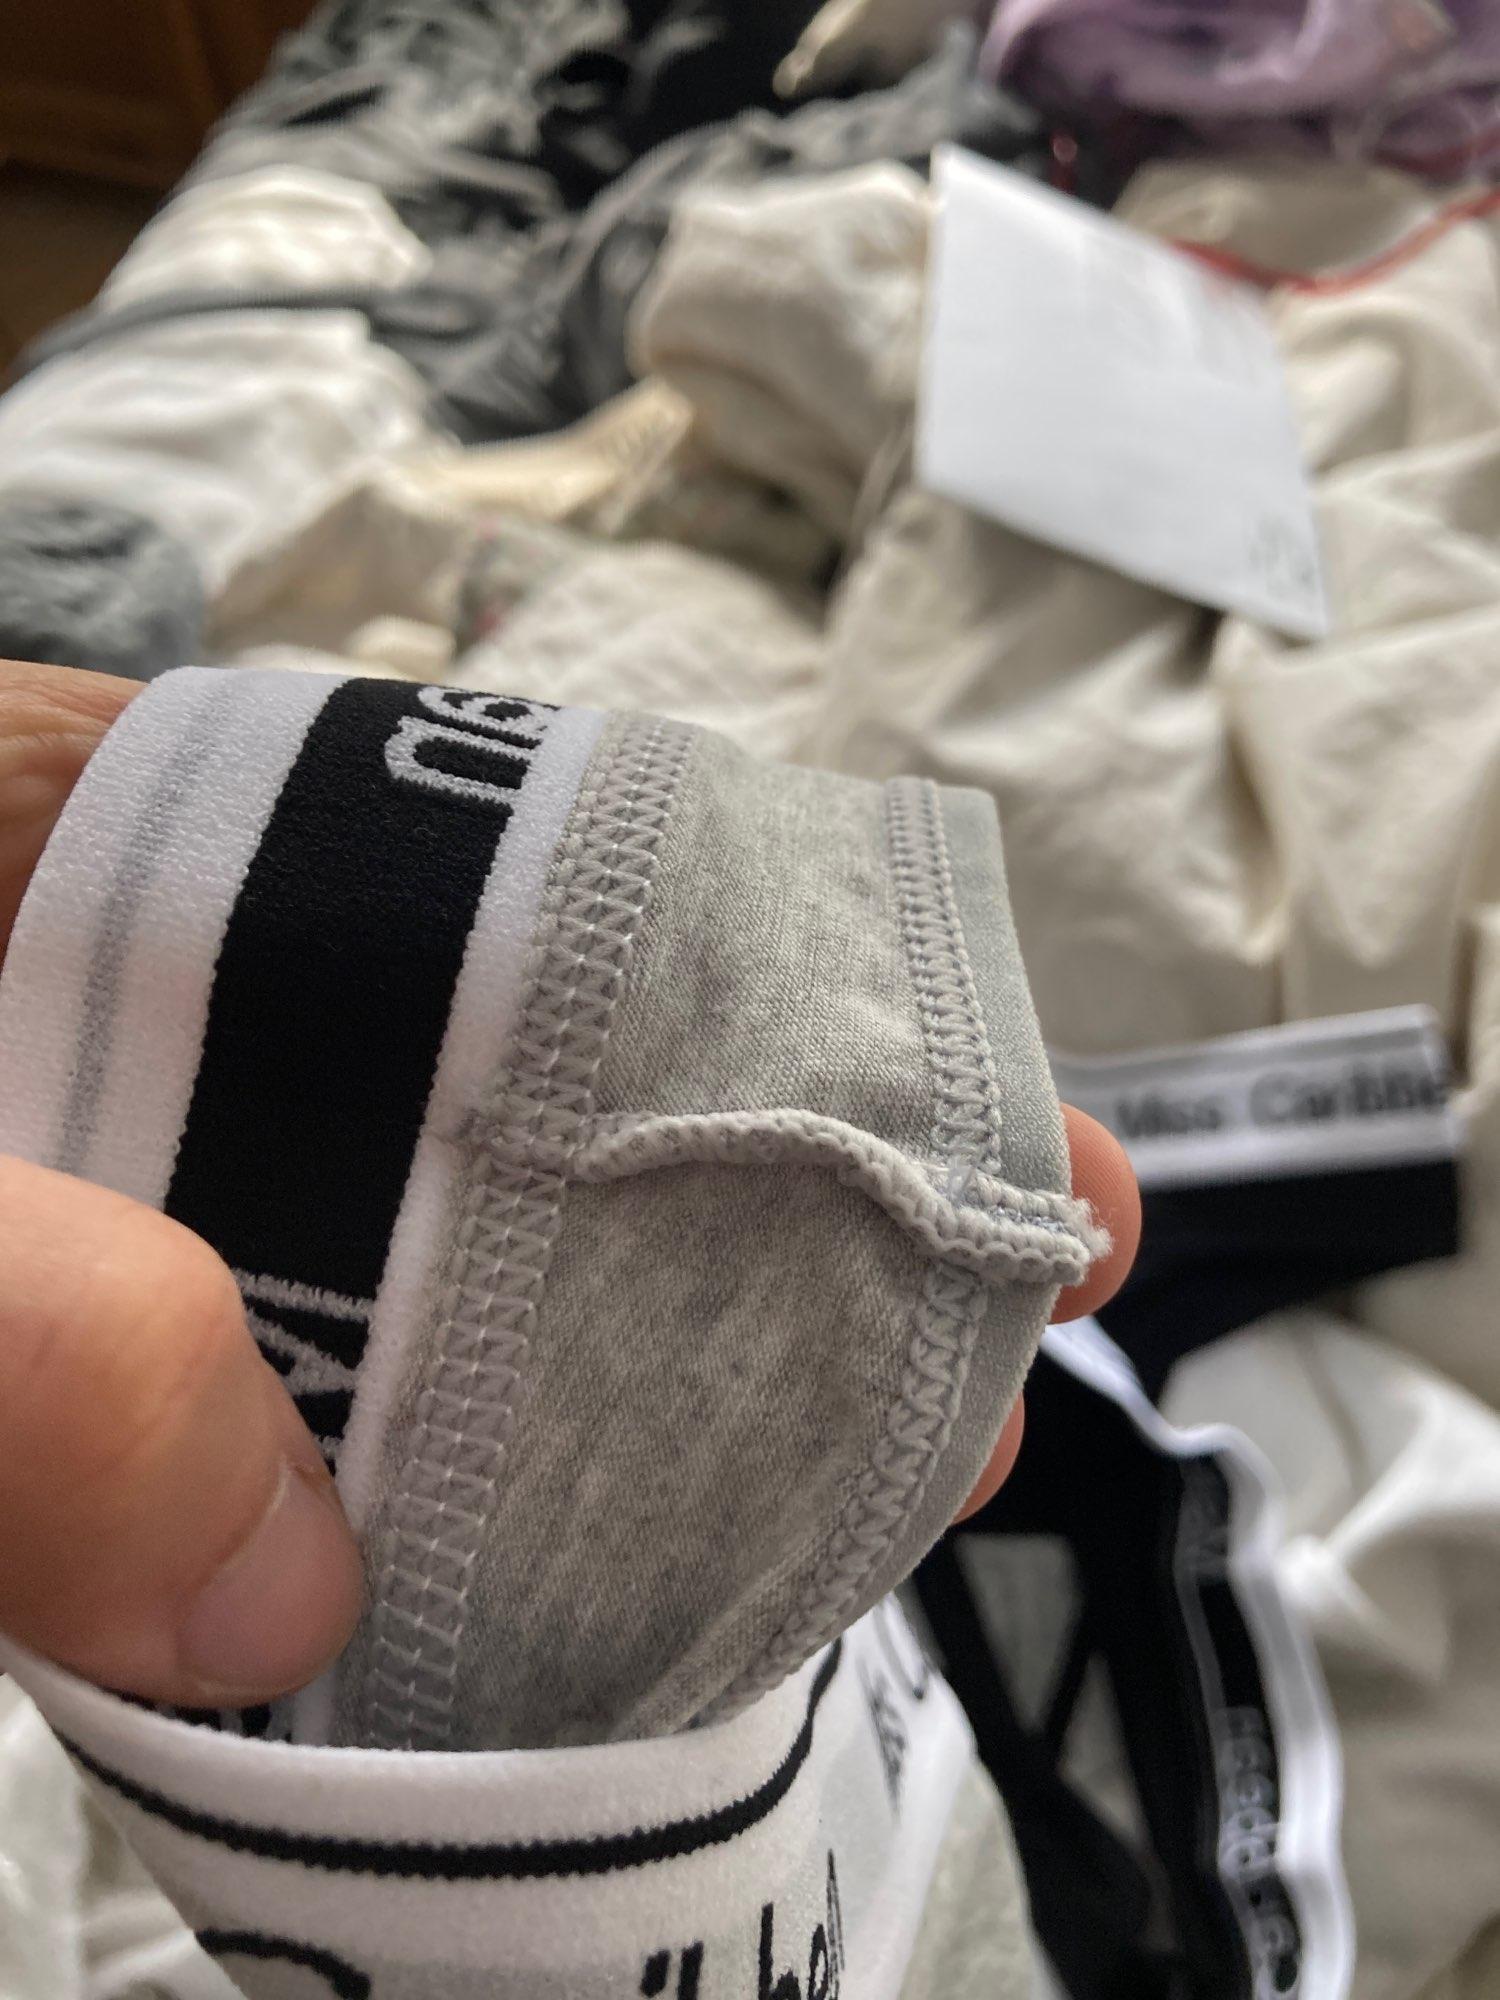 ALLMIX 3Pcs/lot Sexy Women's Cotton Panties Set Underwear Seamless Letter Thongs Low Waist Female Sport G-String Lady Lingerie photo review